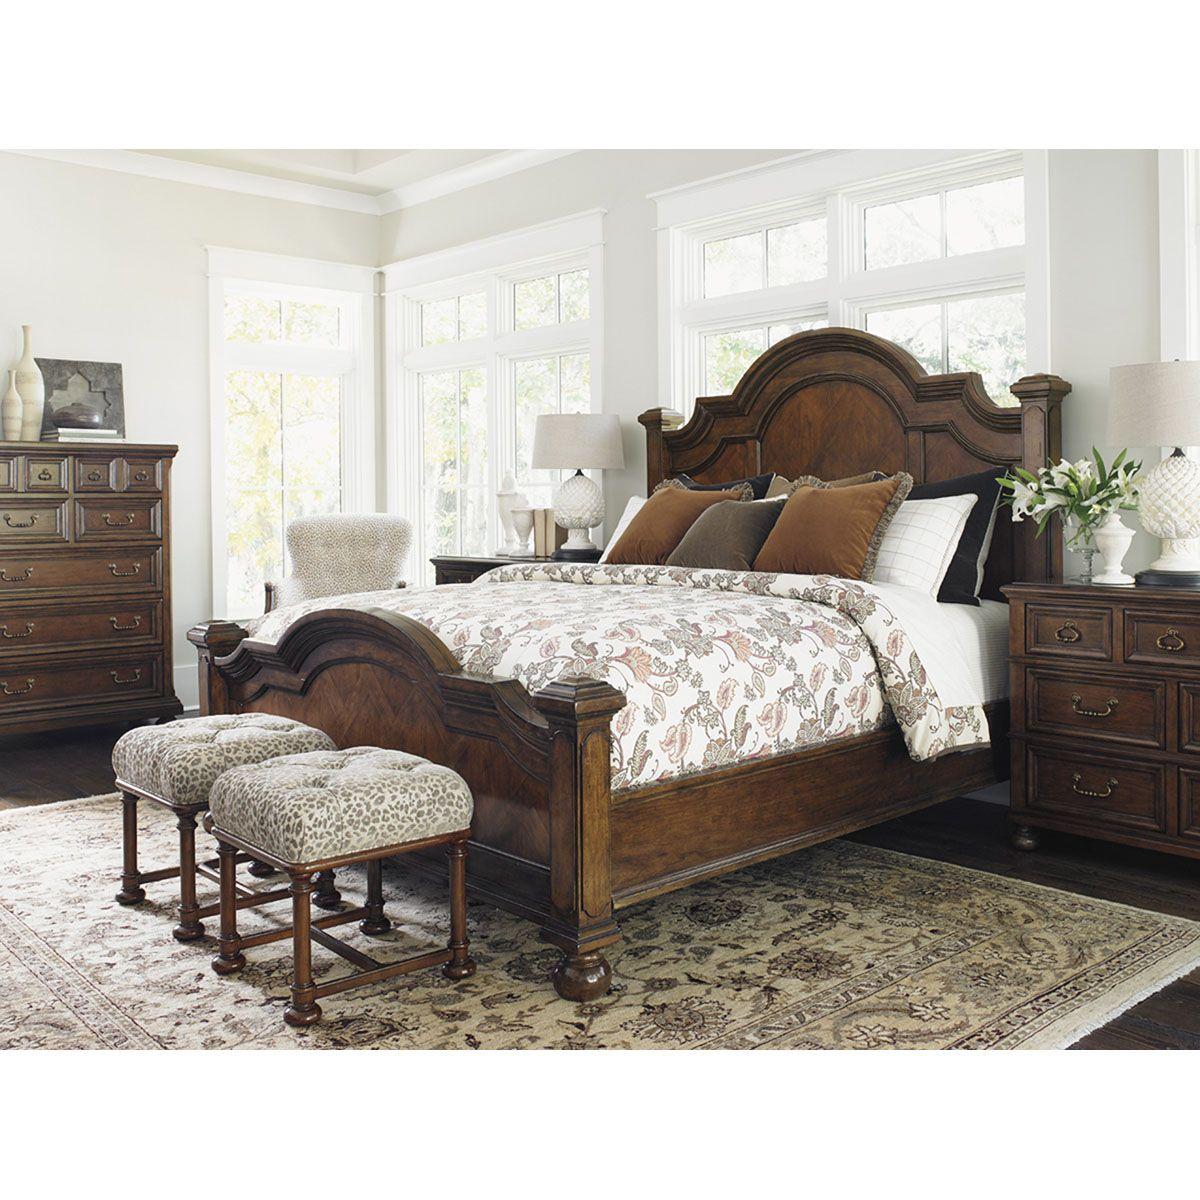 Lexington Home Brands Shelton Bachelor'S Chest 945624